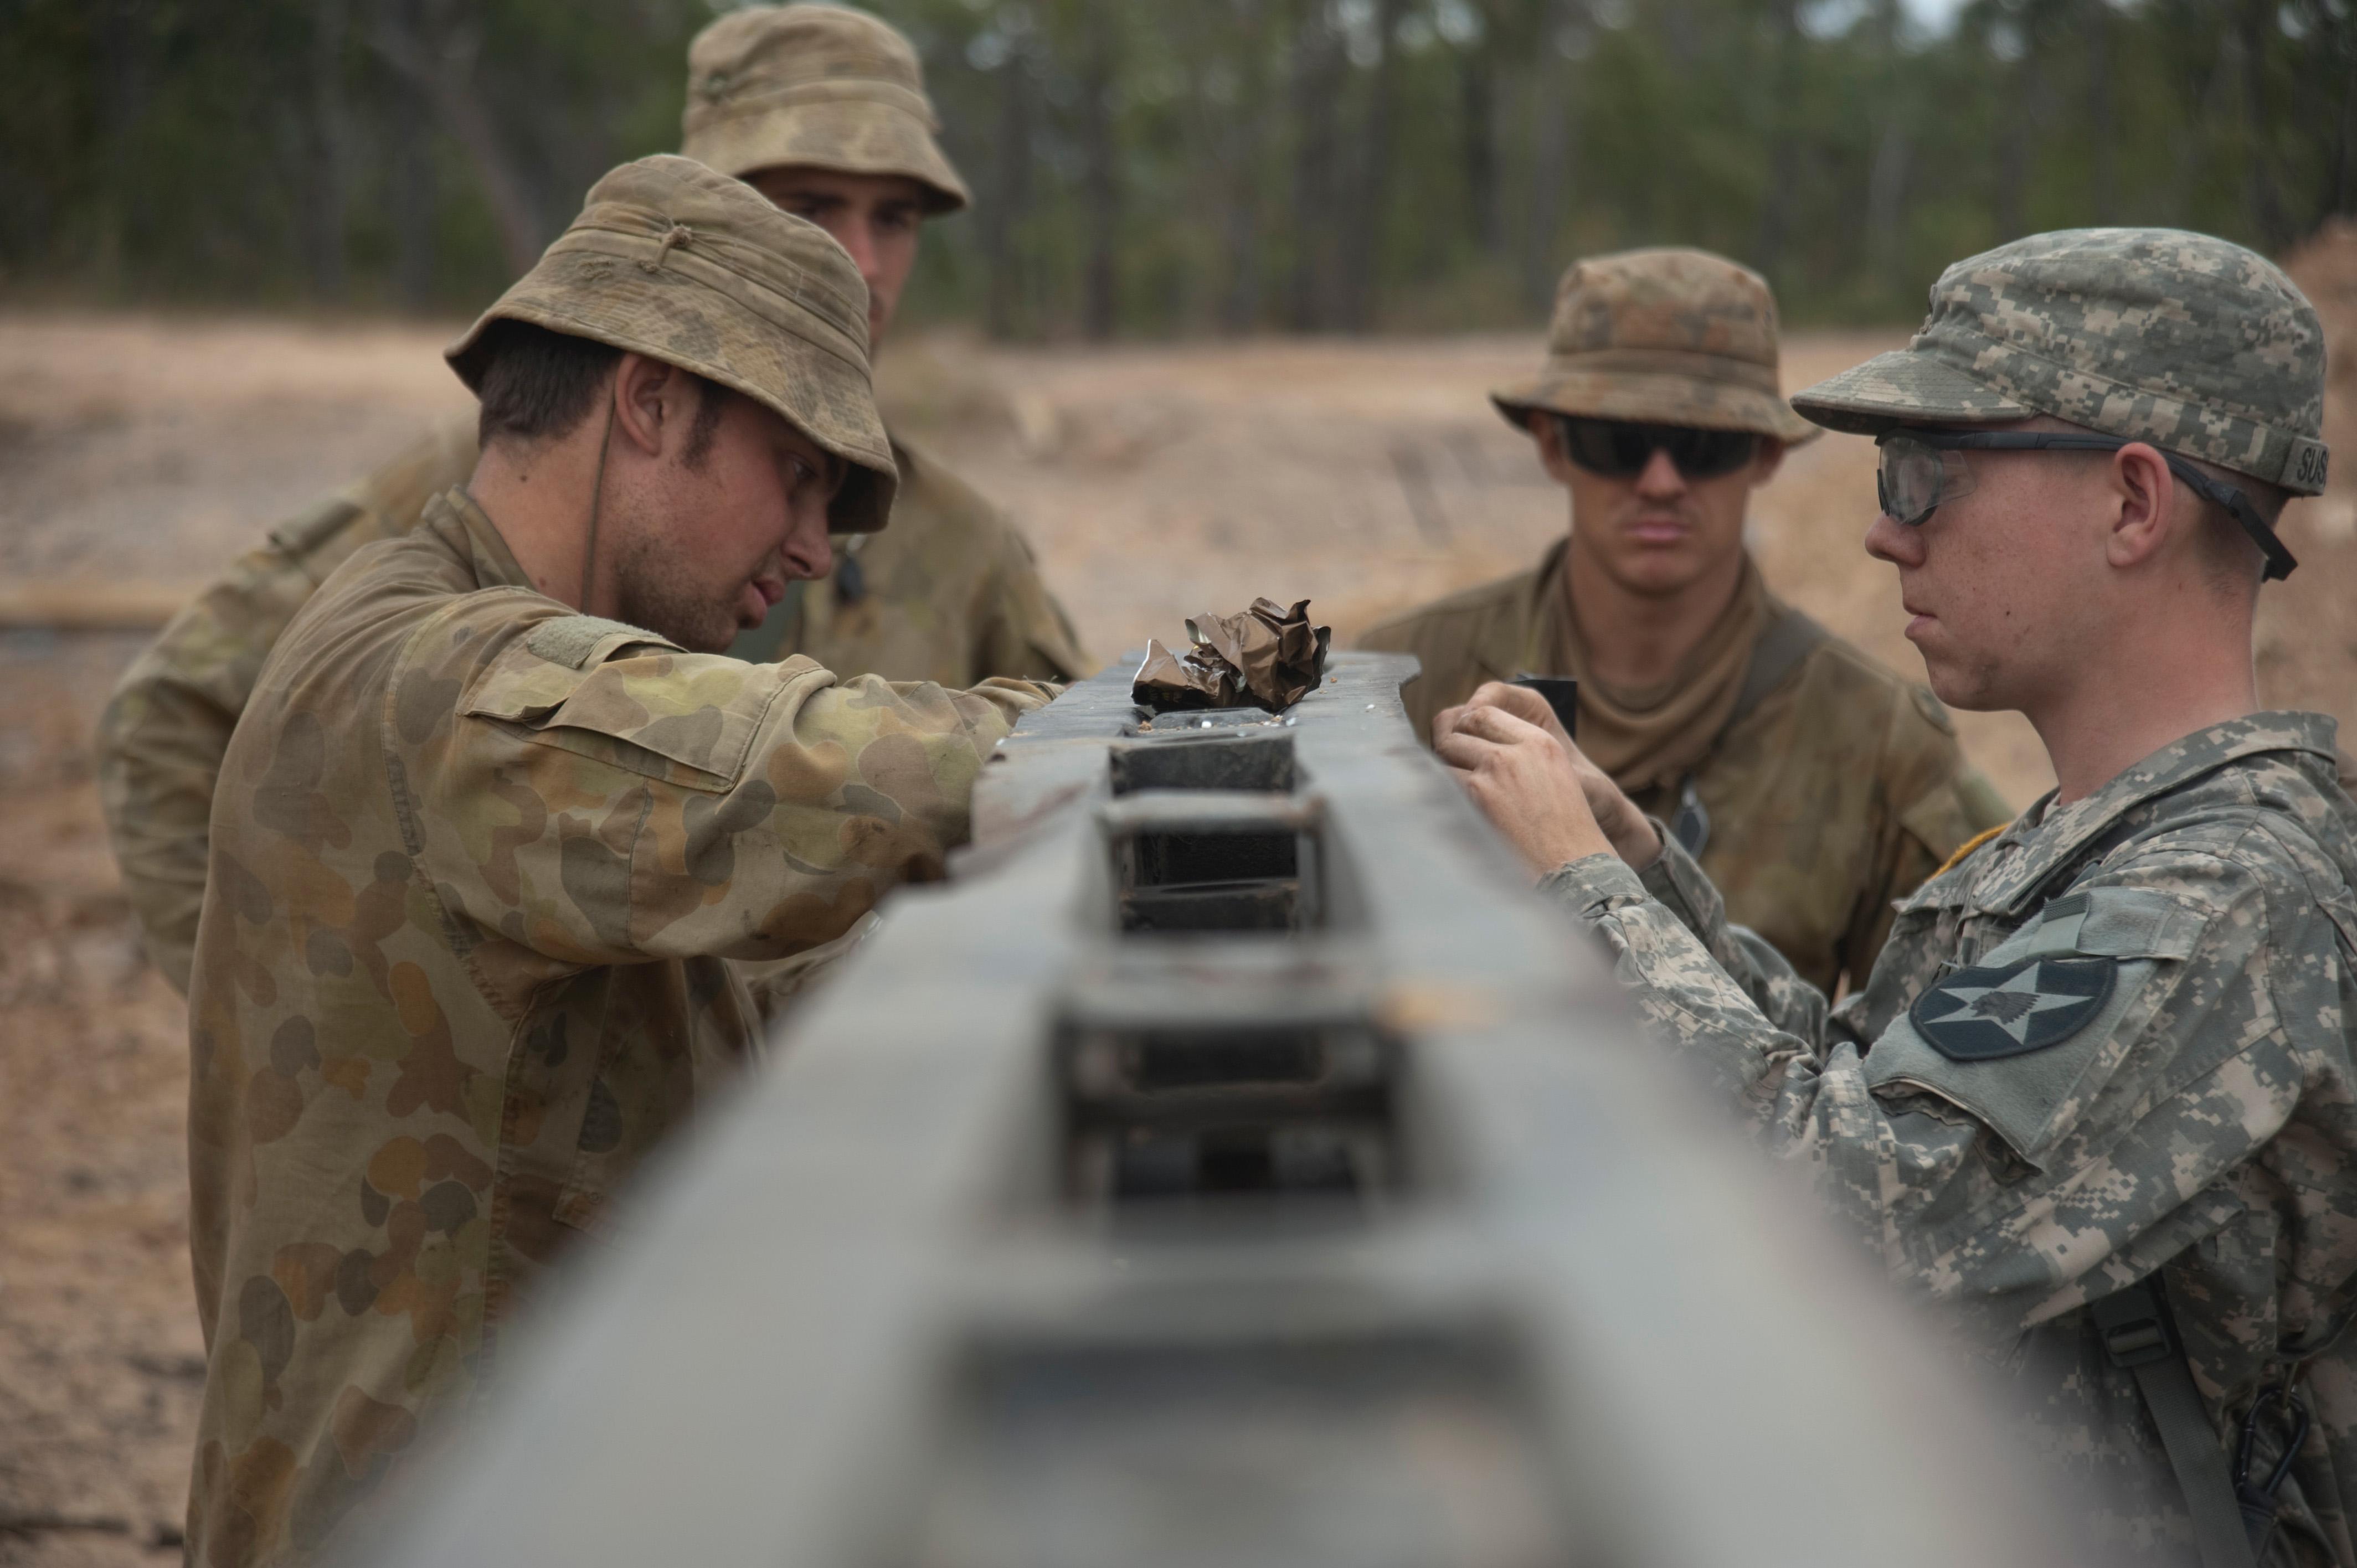 File:Defense.gov News Photo 110715-N-KG738-238 - U.S. Army ...